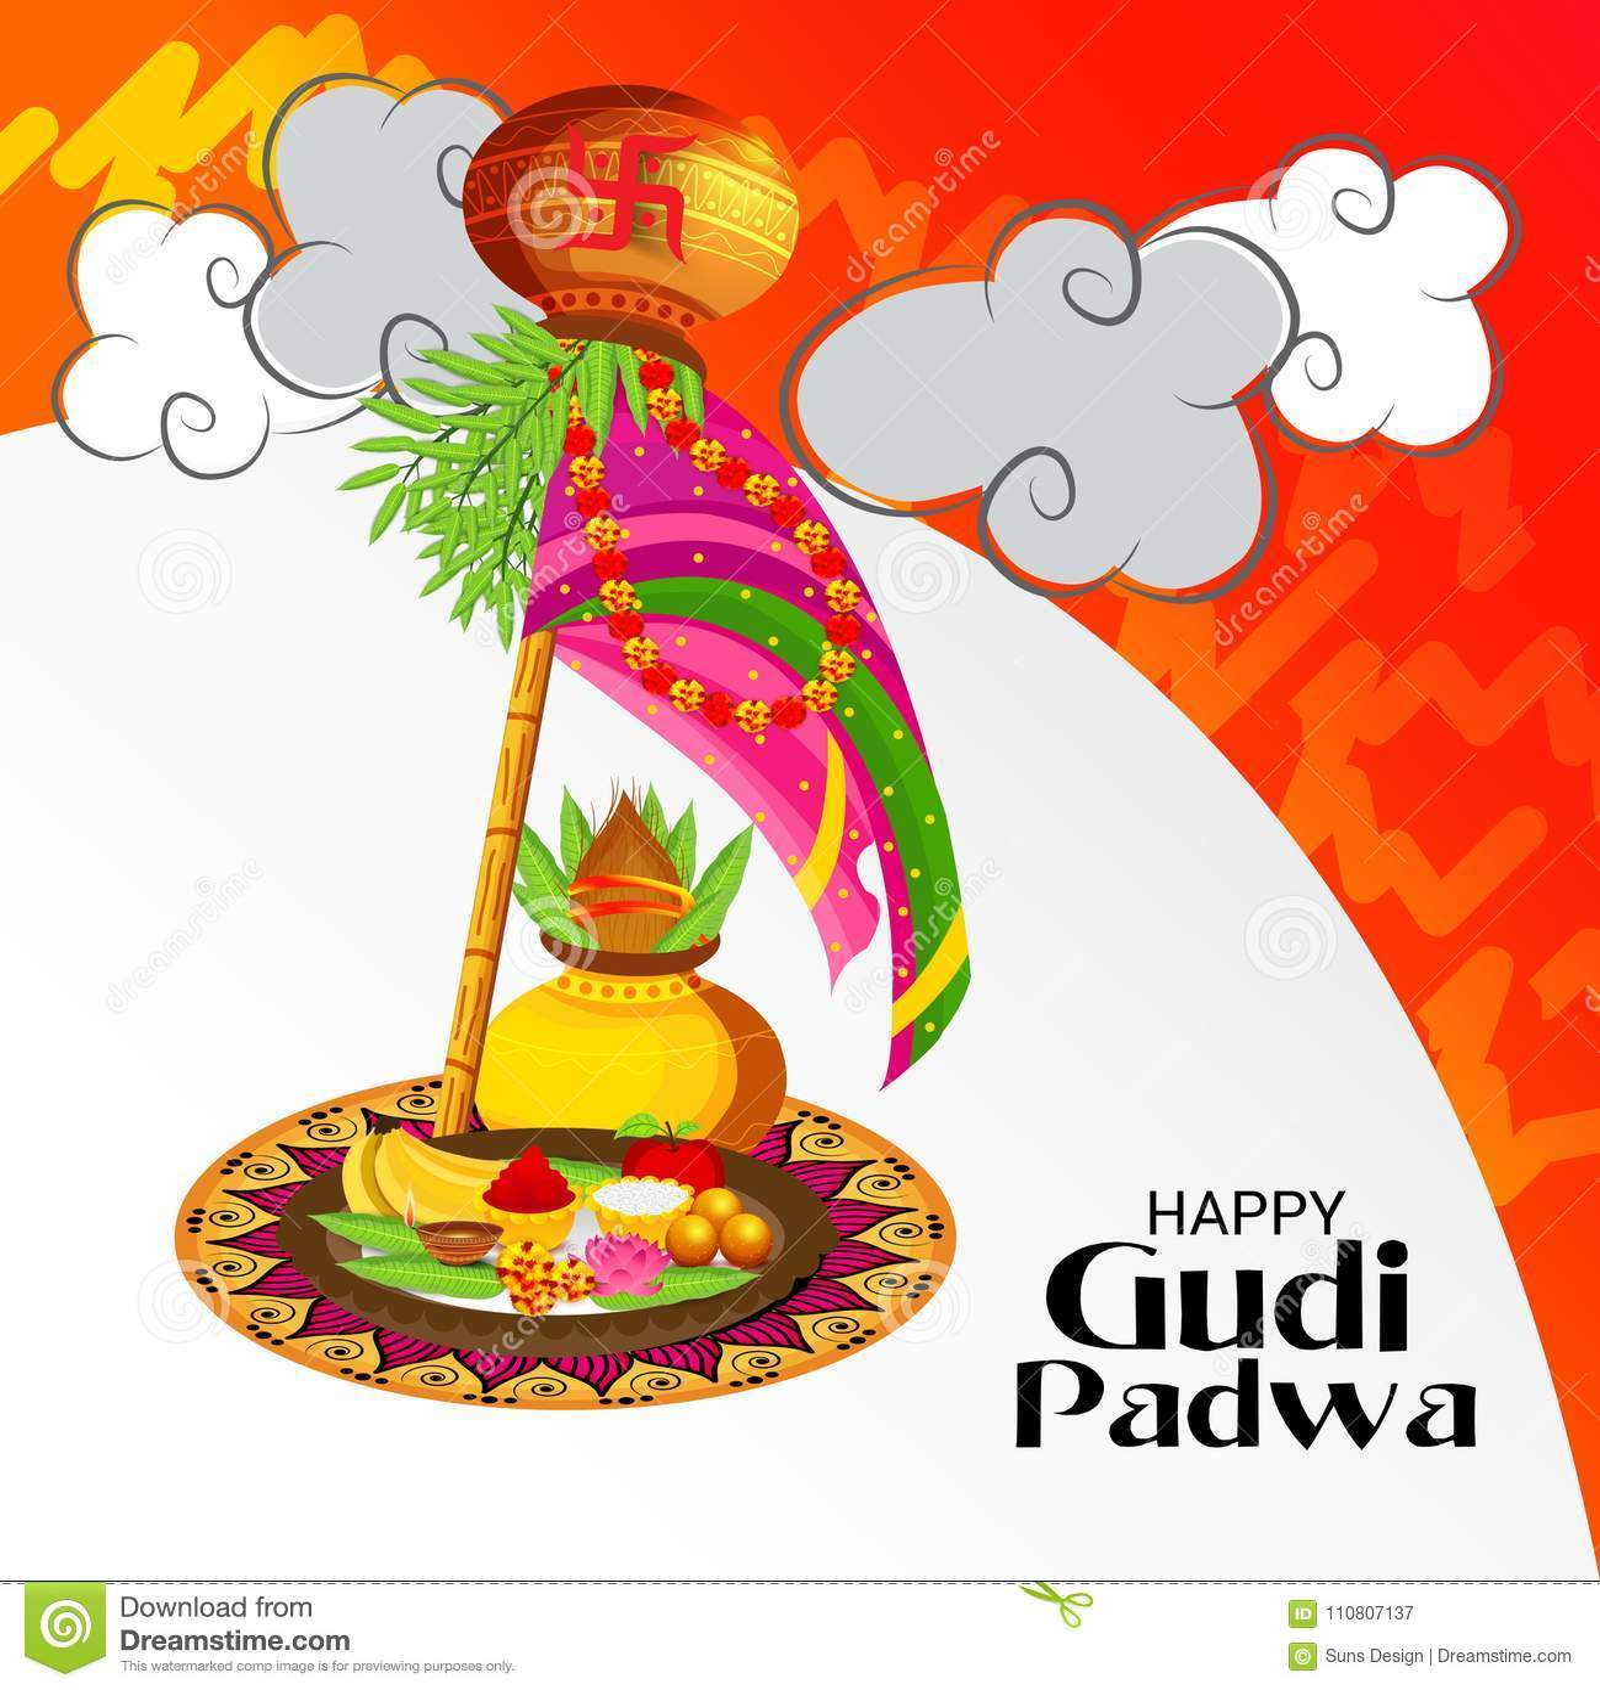 Happy gudi padwa marathi new year stock illustration illustration download happy gudi padwa marathi new year stock illustration illustration of card india m4hsunfo